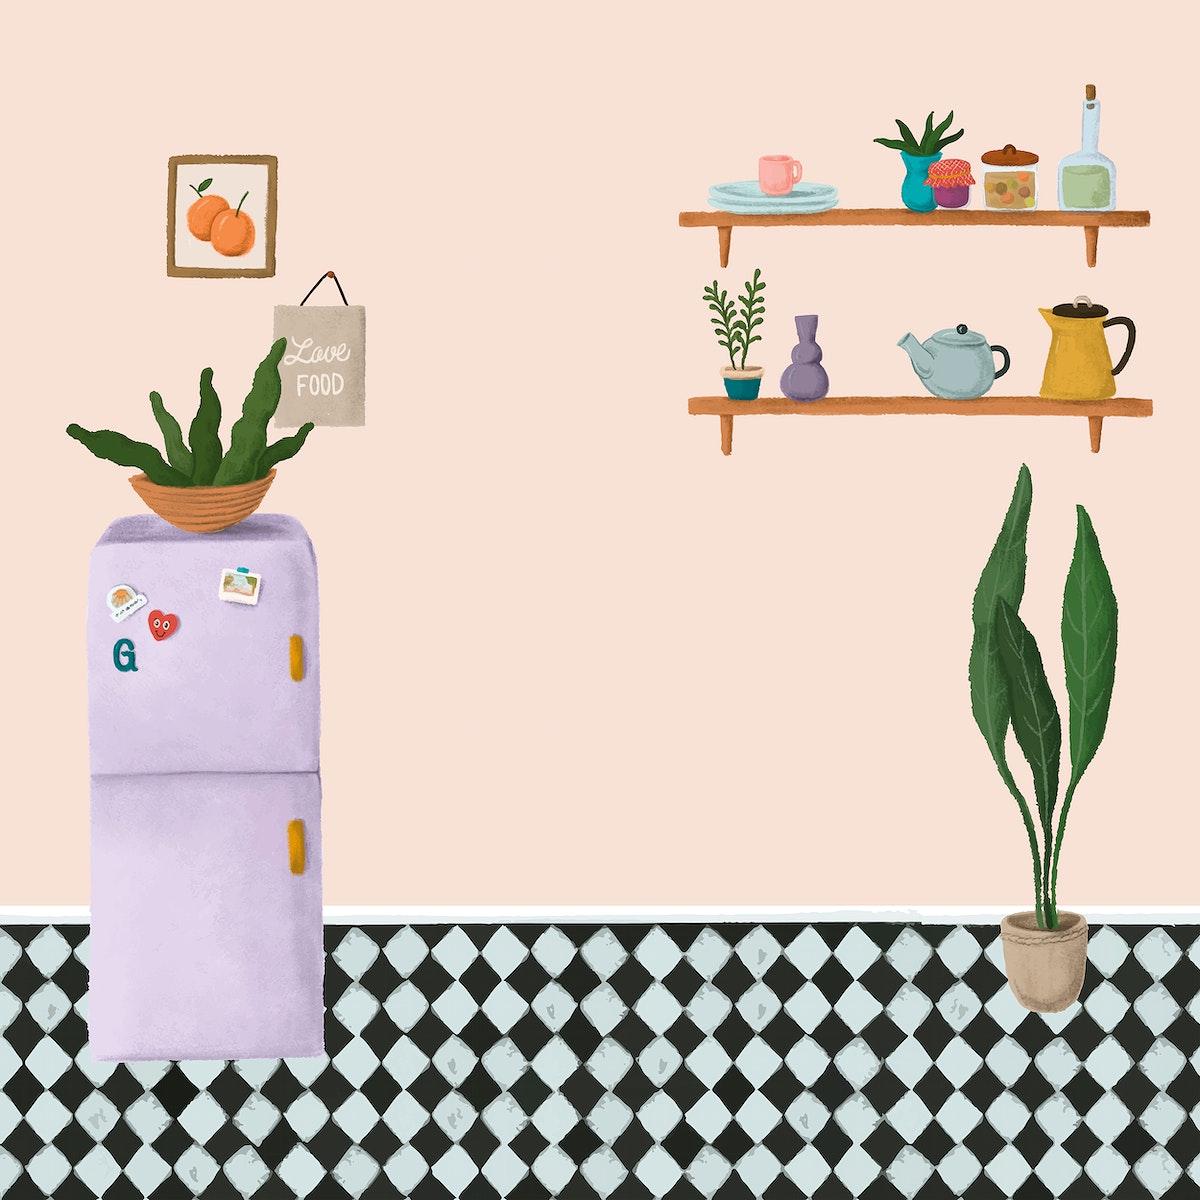 Purple fridge in a peach pink kitchen sketch style vector